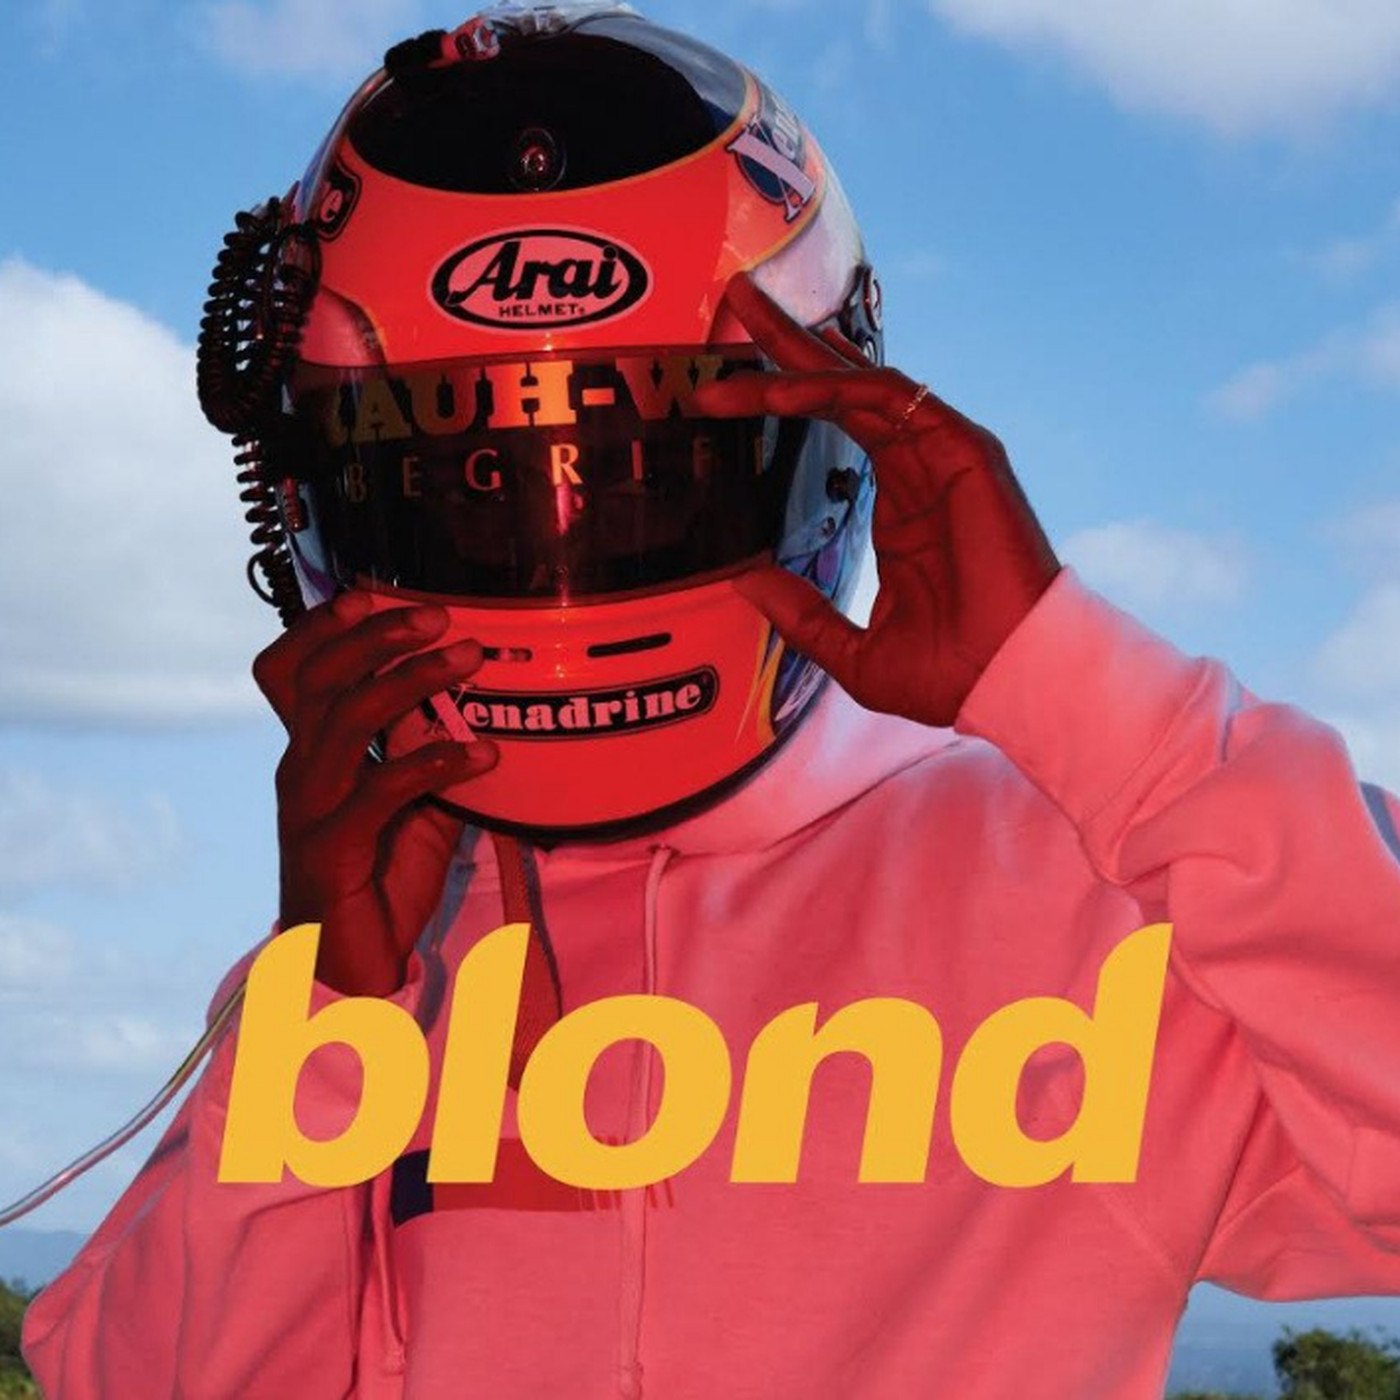 Image result for frank ocean blonde album cover